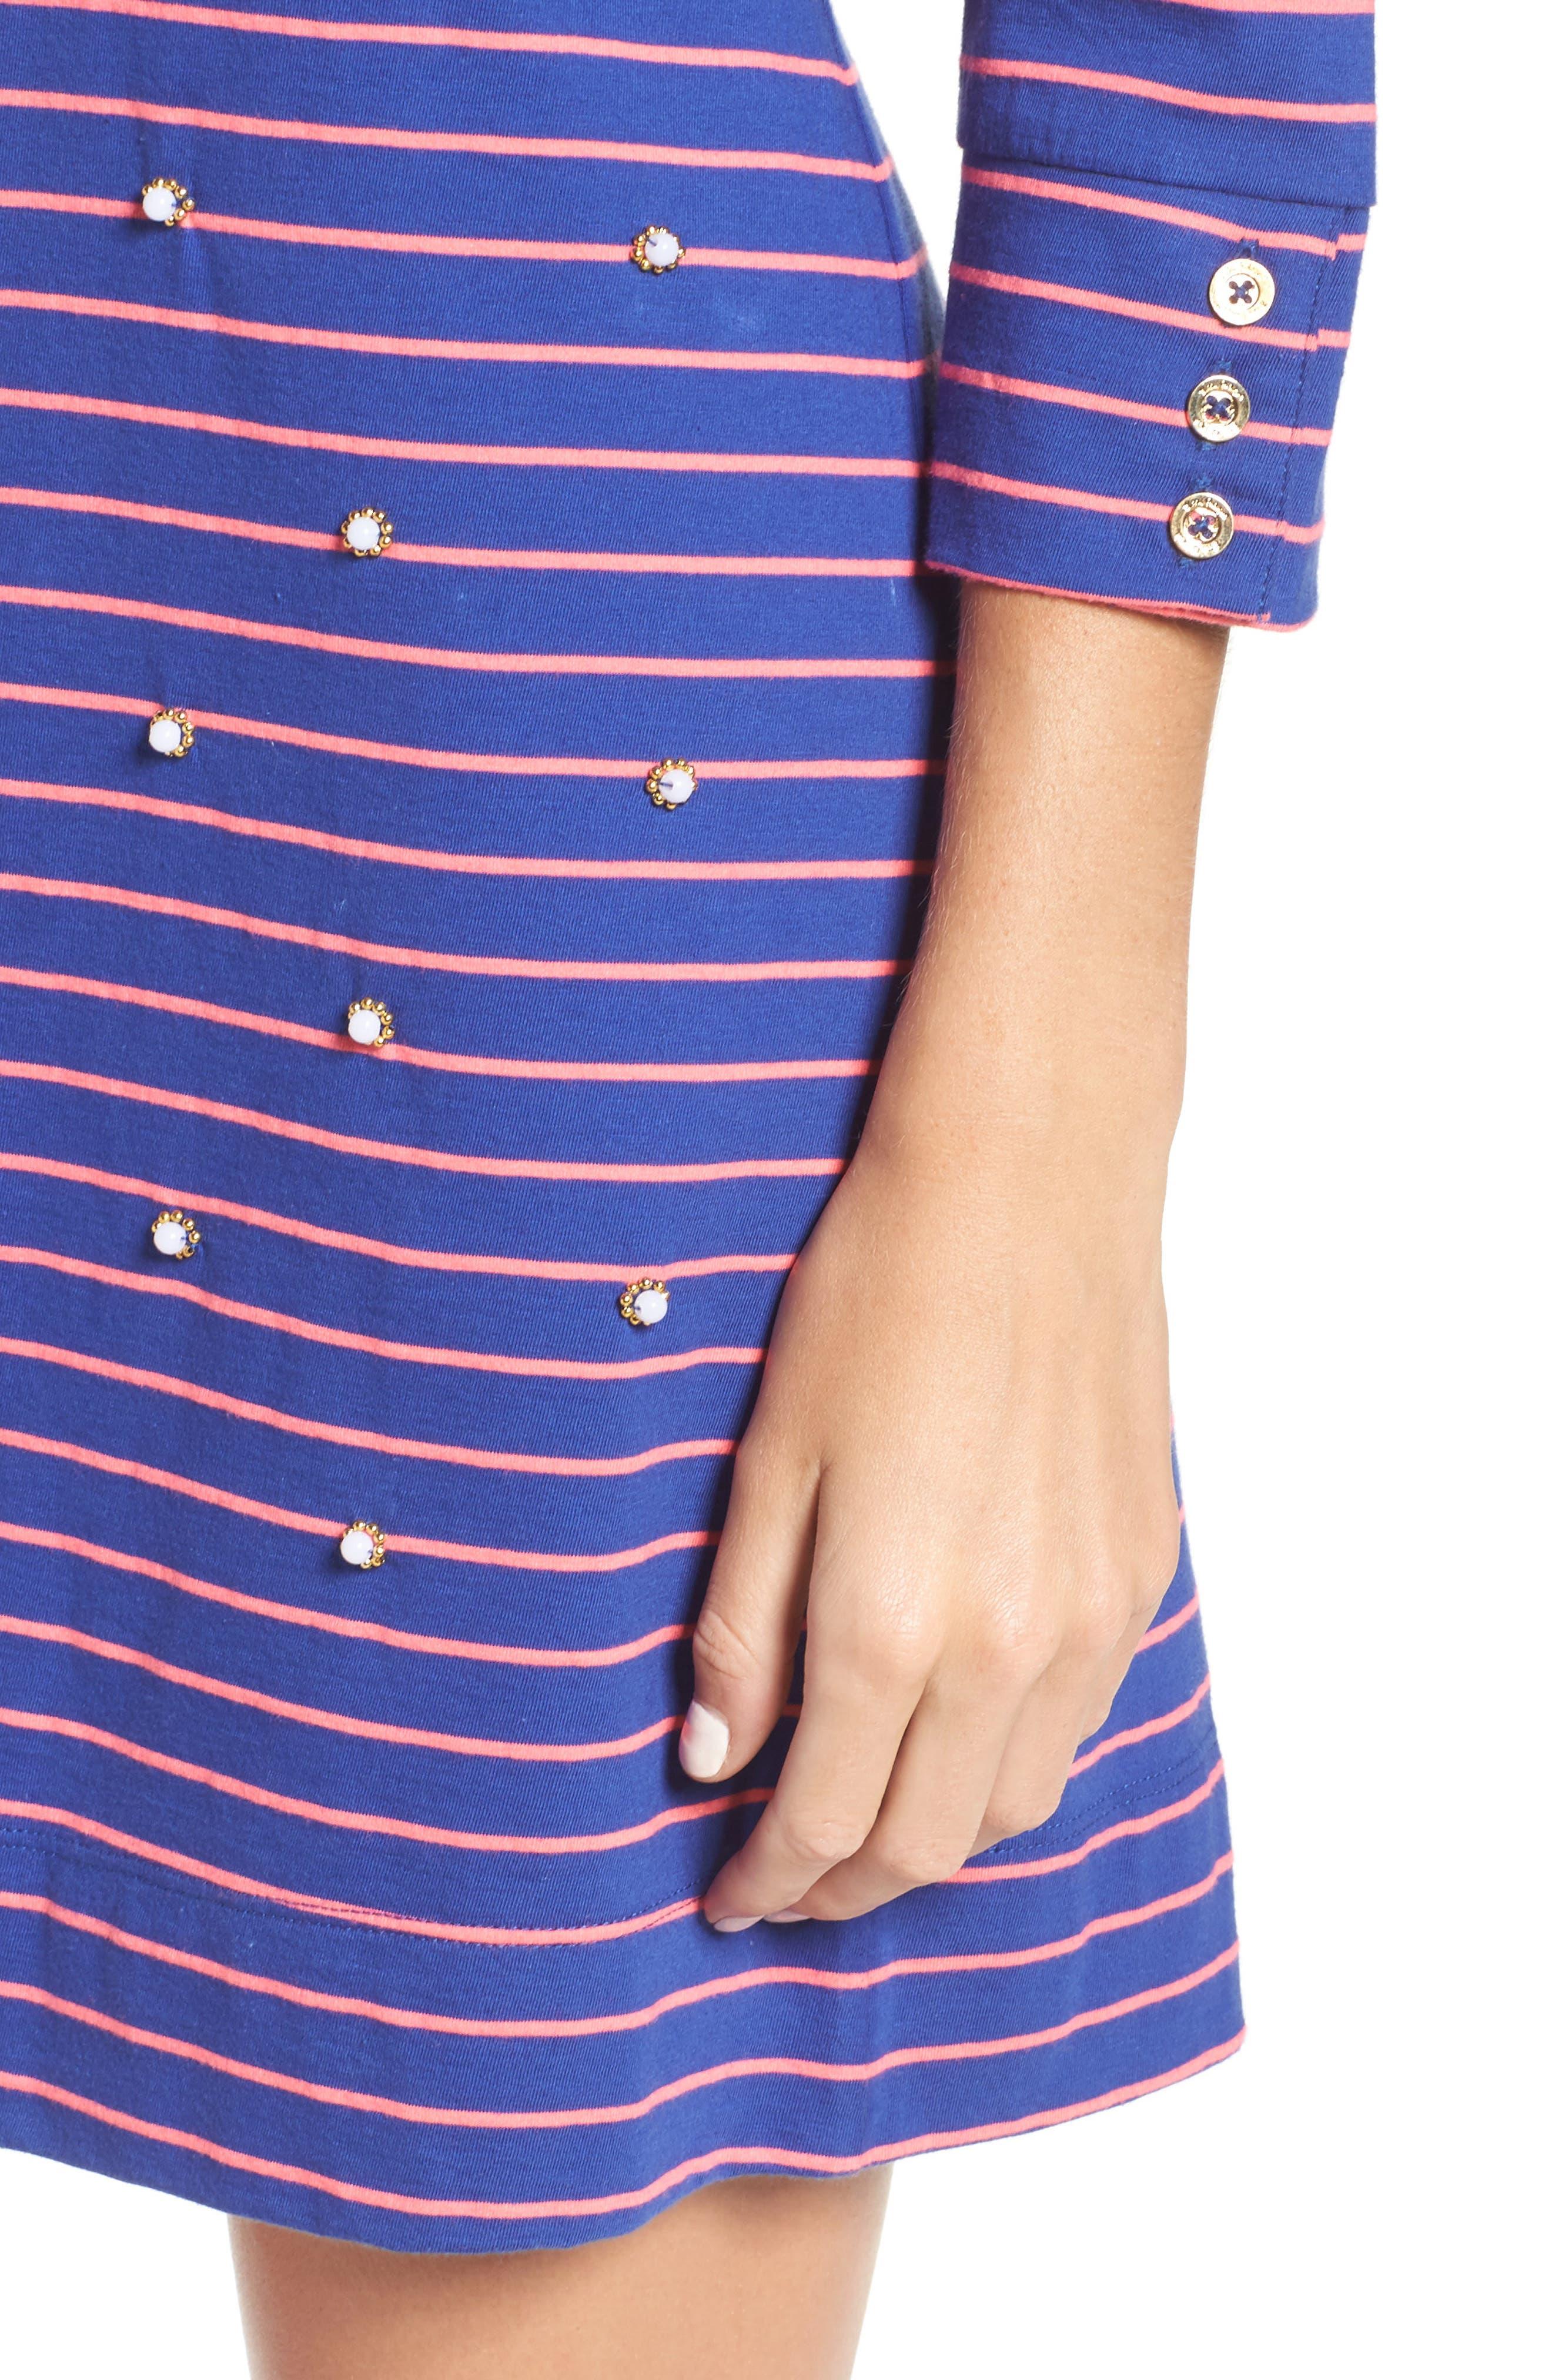 Merrit Beaded T-Shirt Dress,                             Alternate thumbnail 4, color,